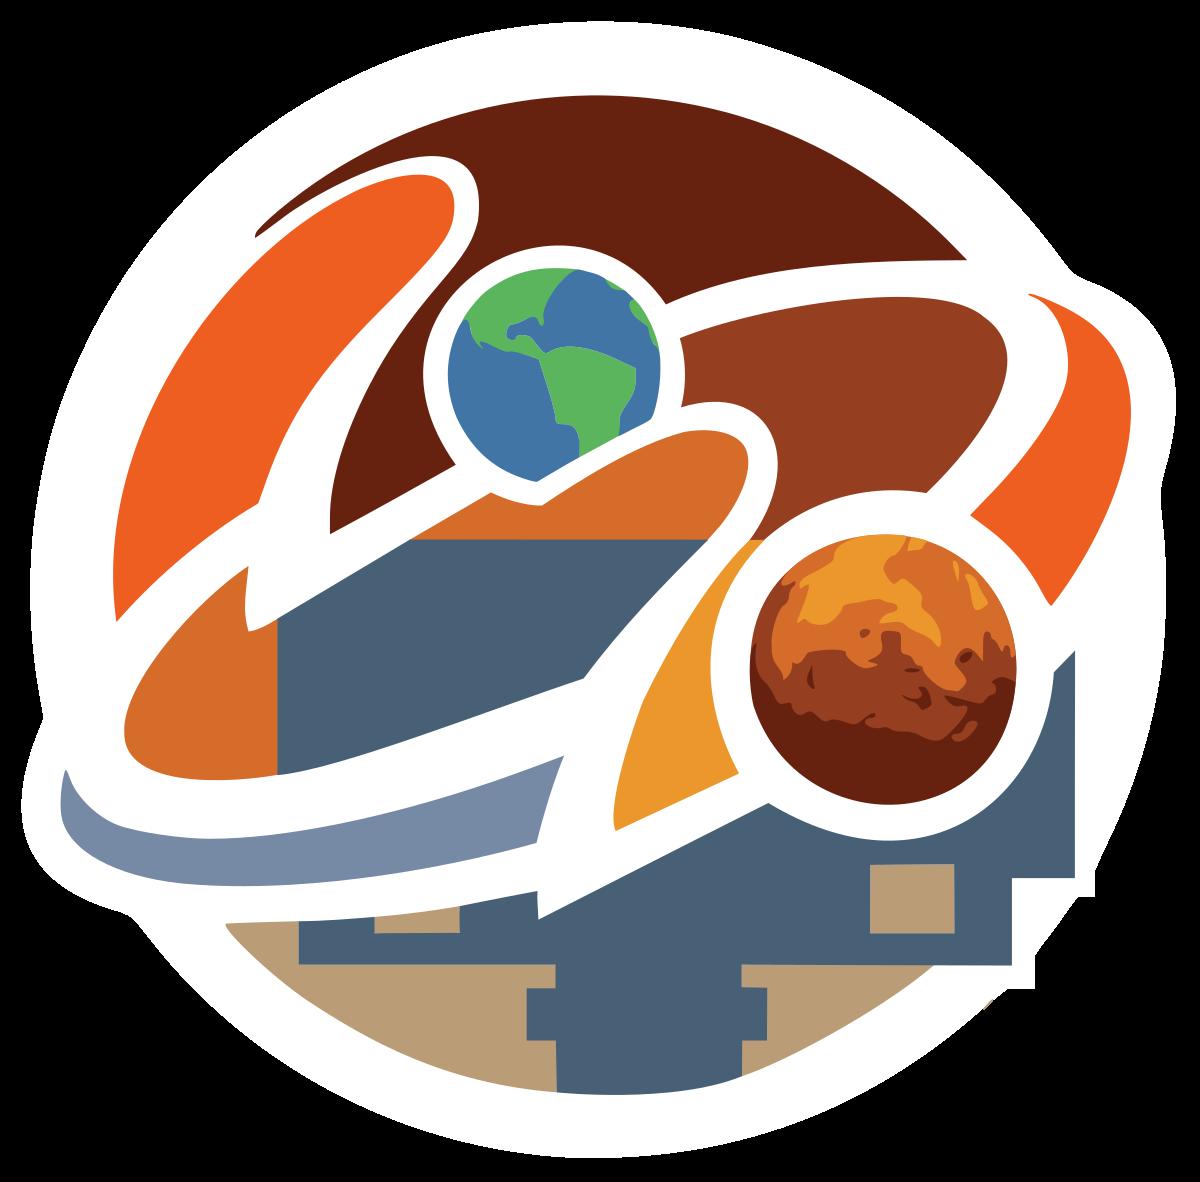 File:Mars 2020 JPL insignia.svg.